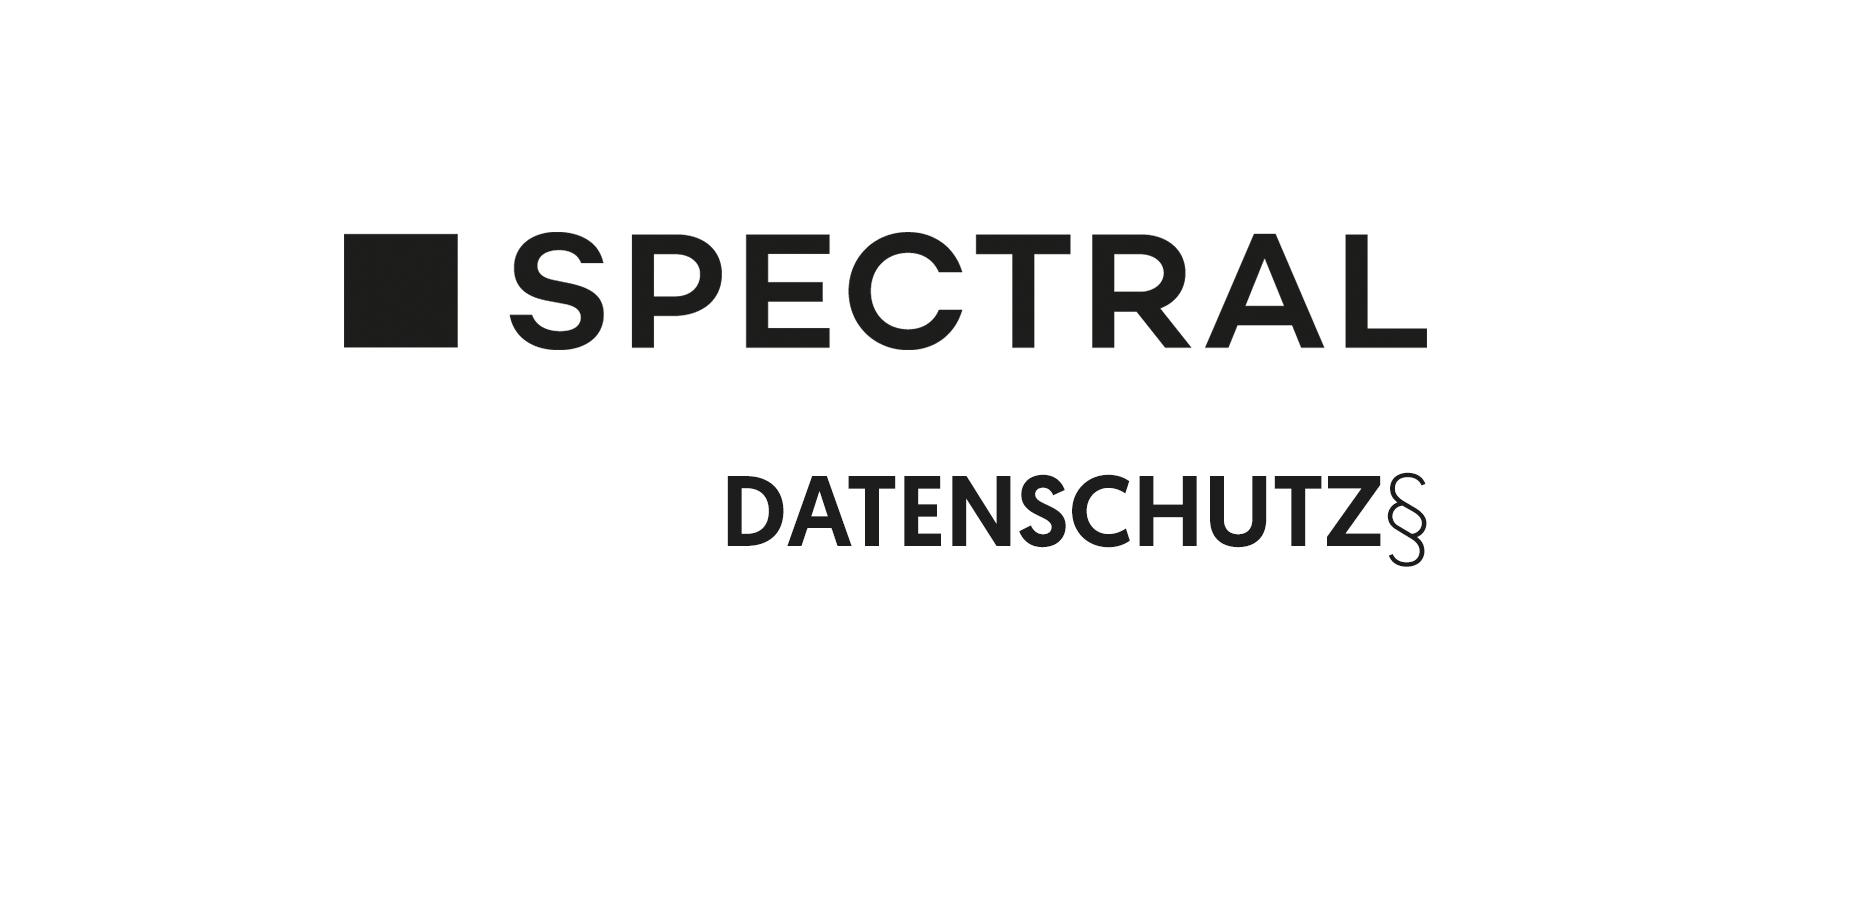 datenschutz_1860x900